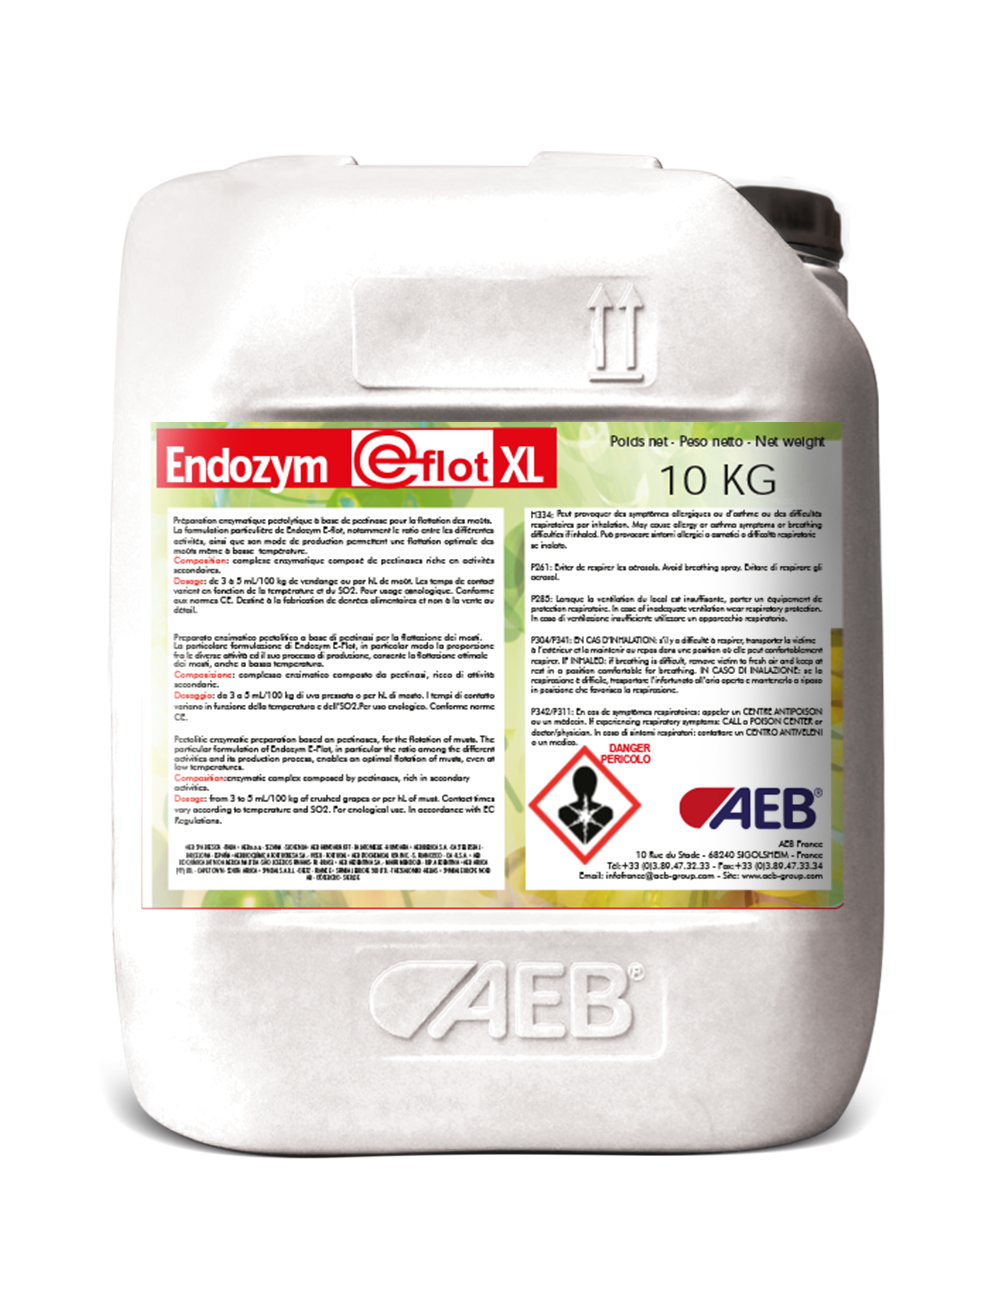 ENDOZYM E-Flot XL